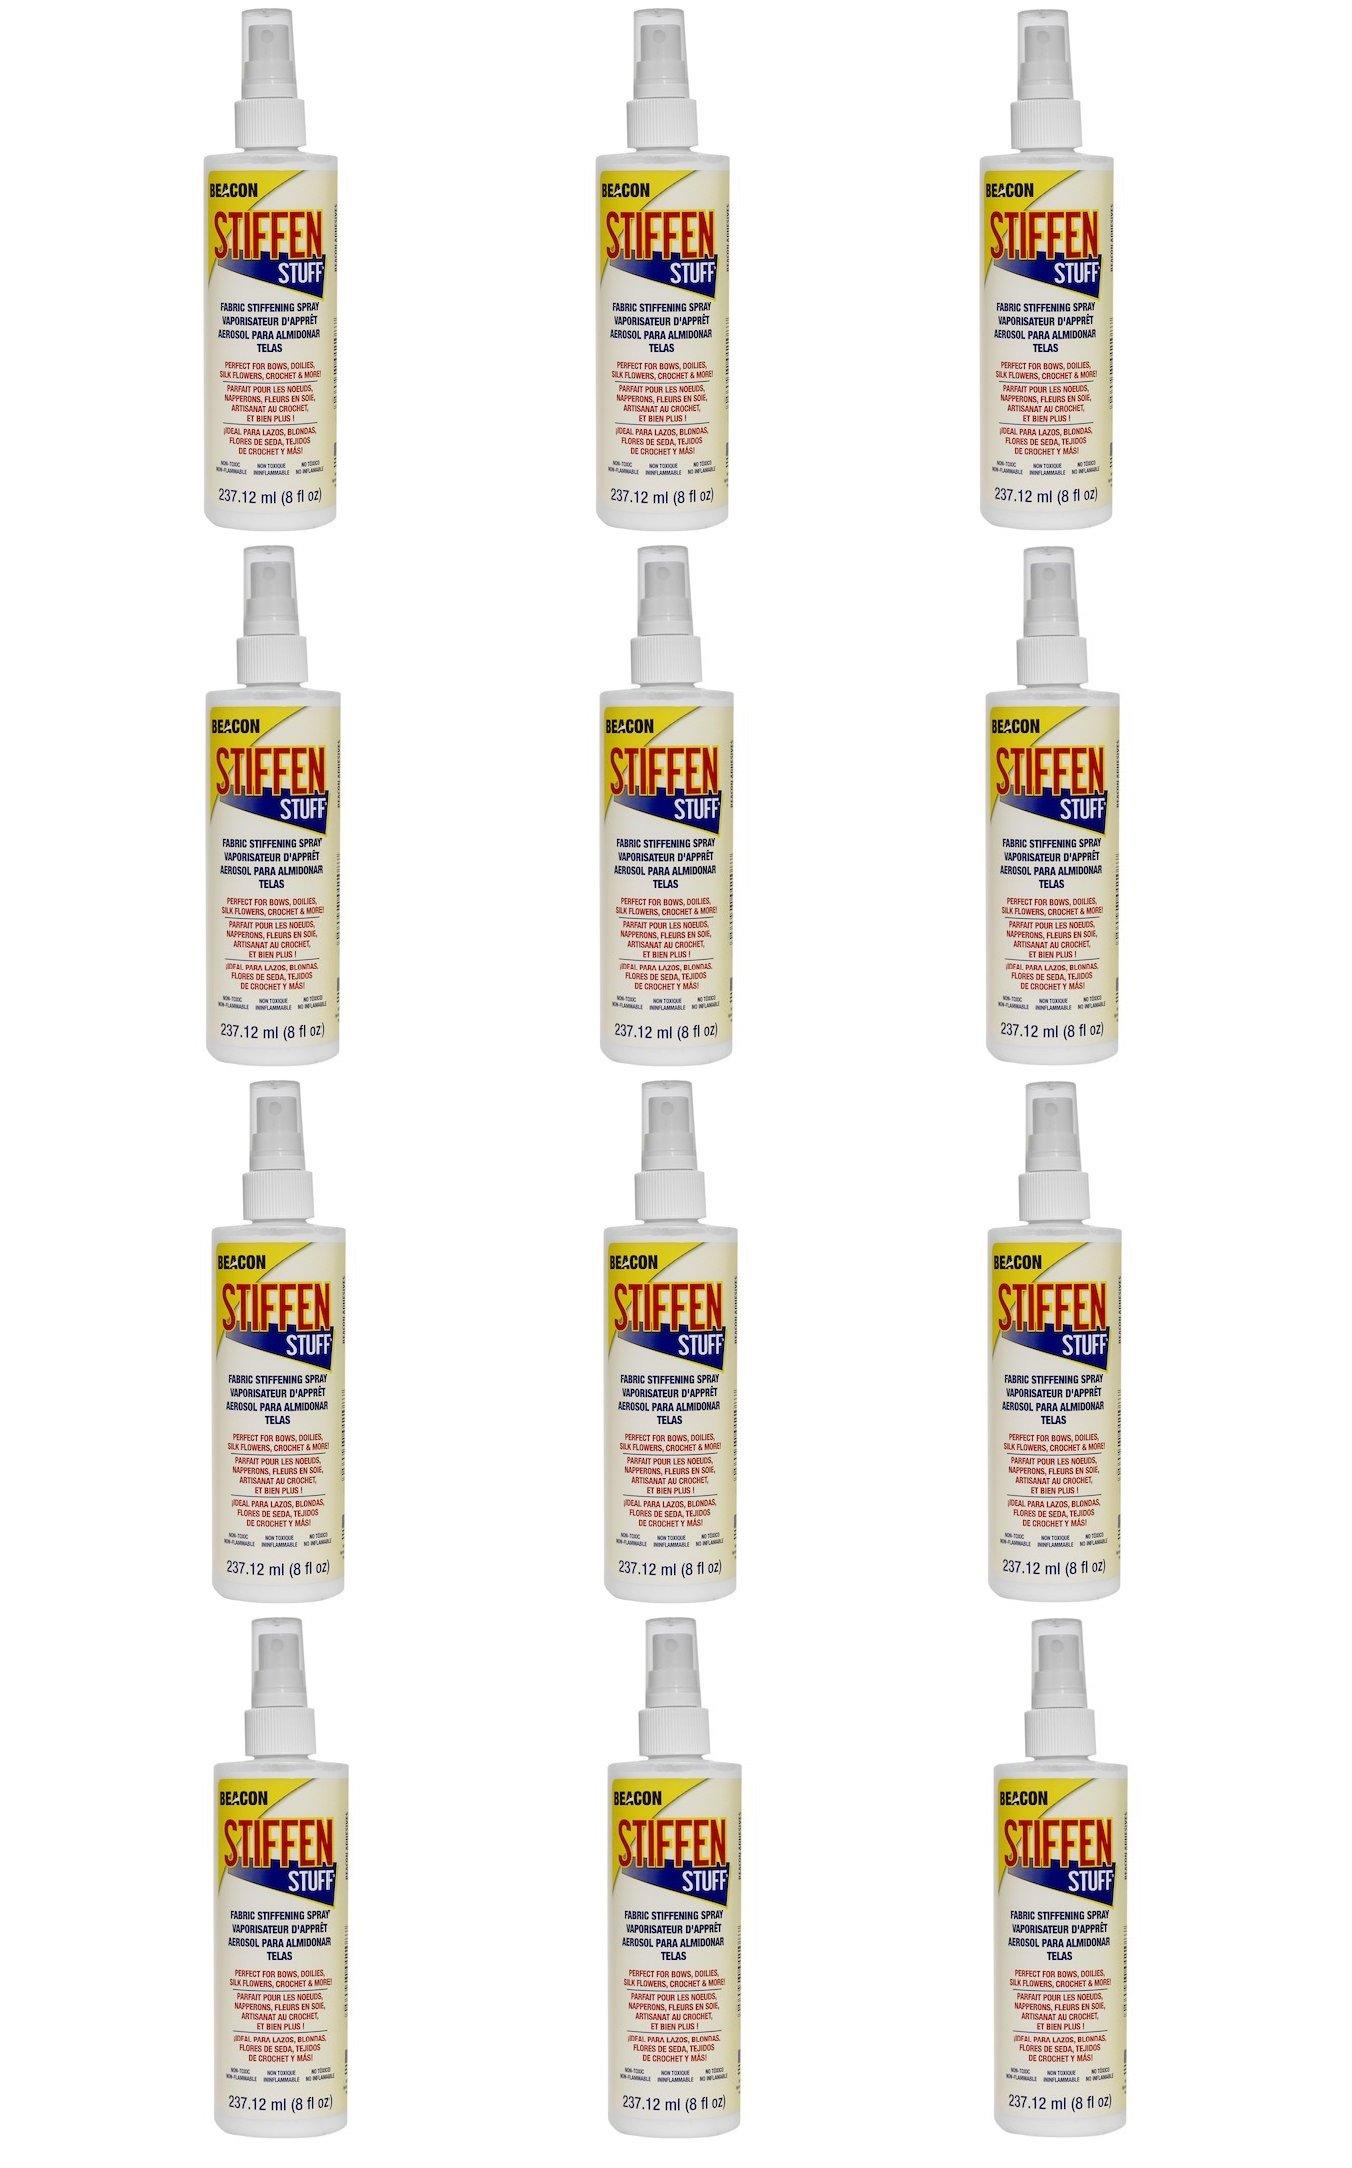 Beacon Stiffen Stuff Spray, 8-Ounce Bottle, 12-Pack